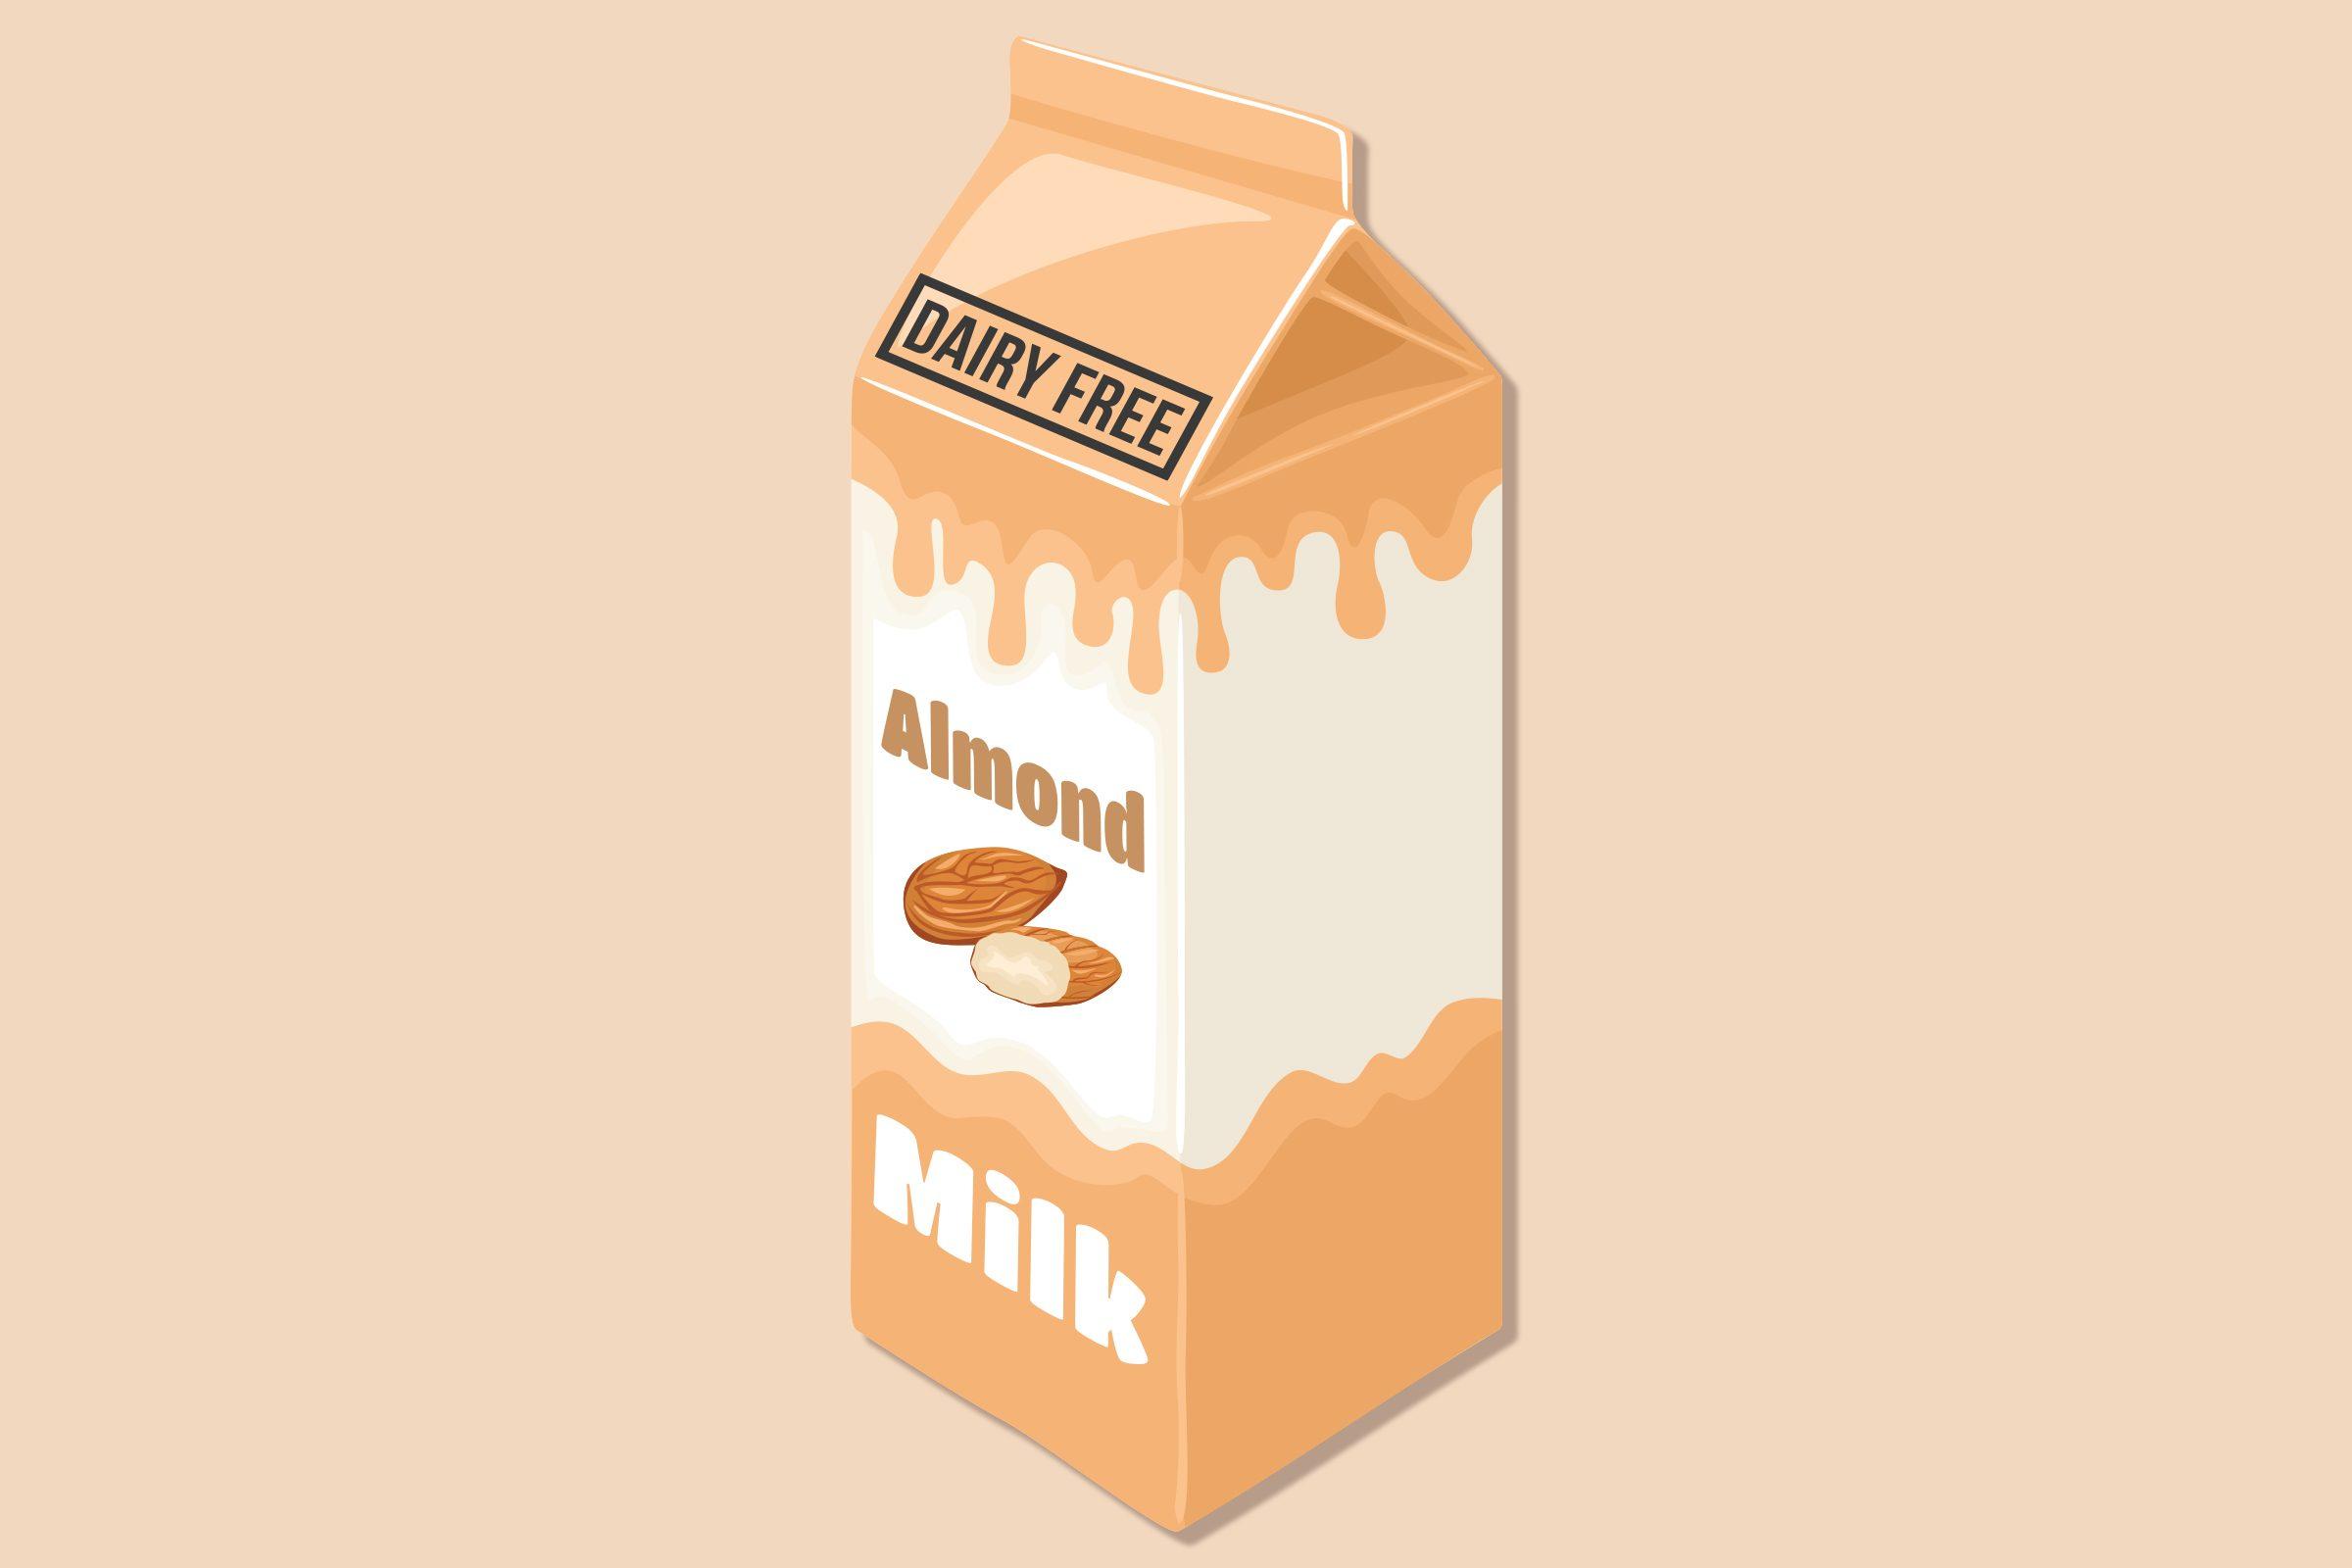 dairy free almond milk